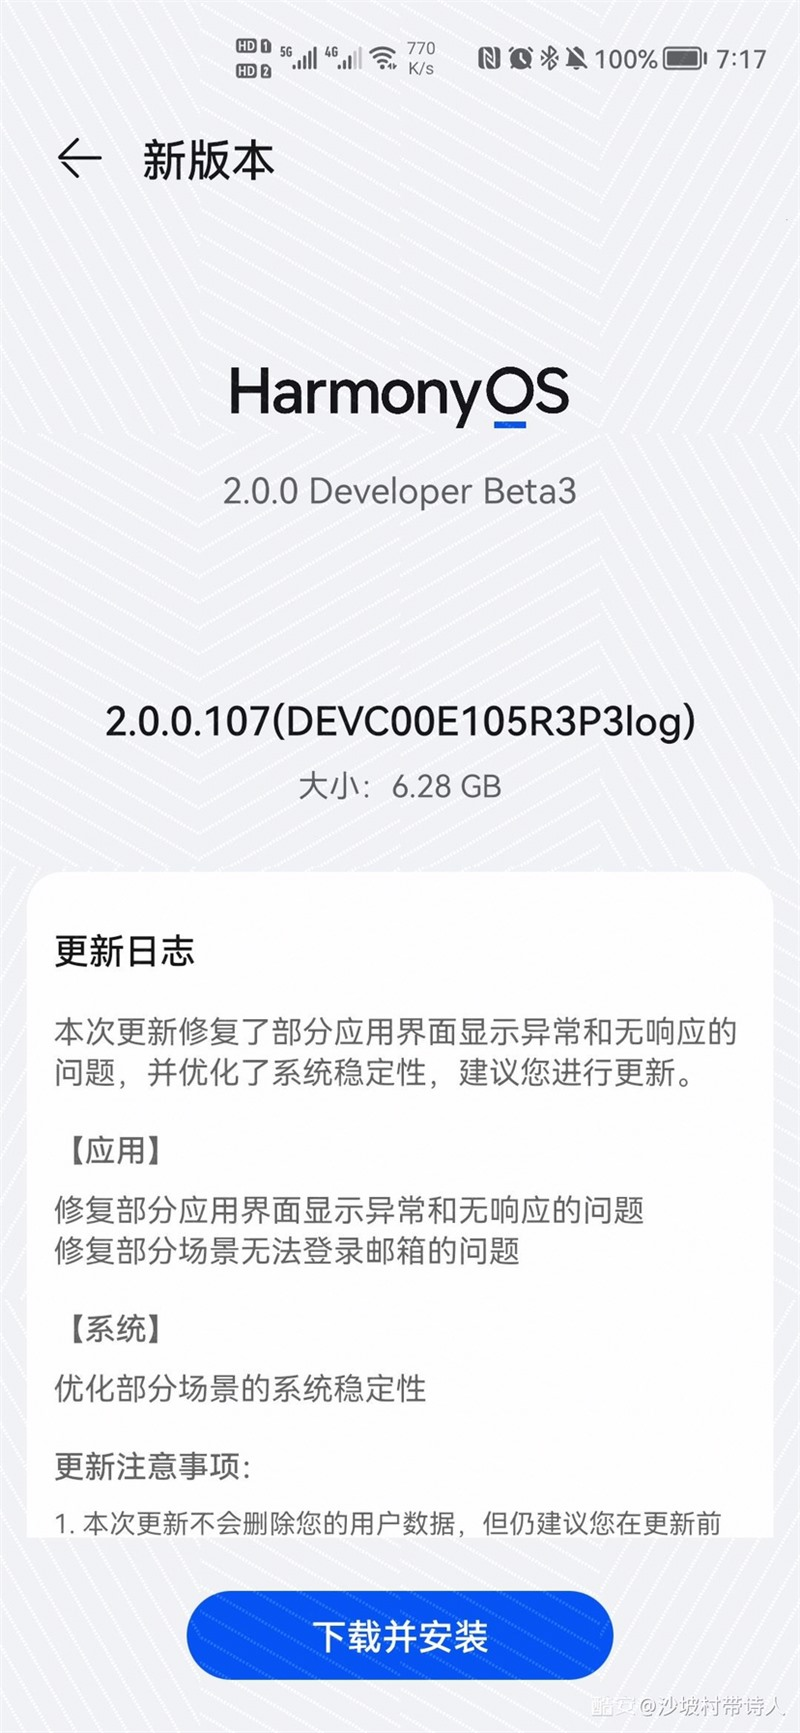 Harmony OS 2.0 dev Beta 3 version 2.0.0.107